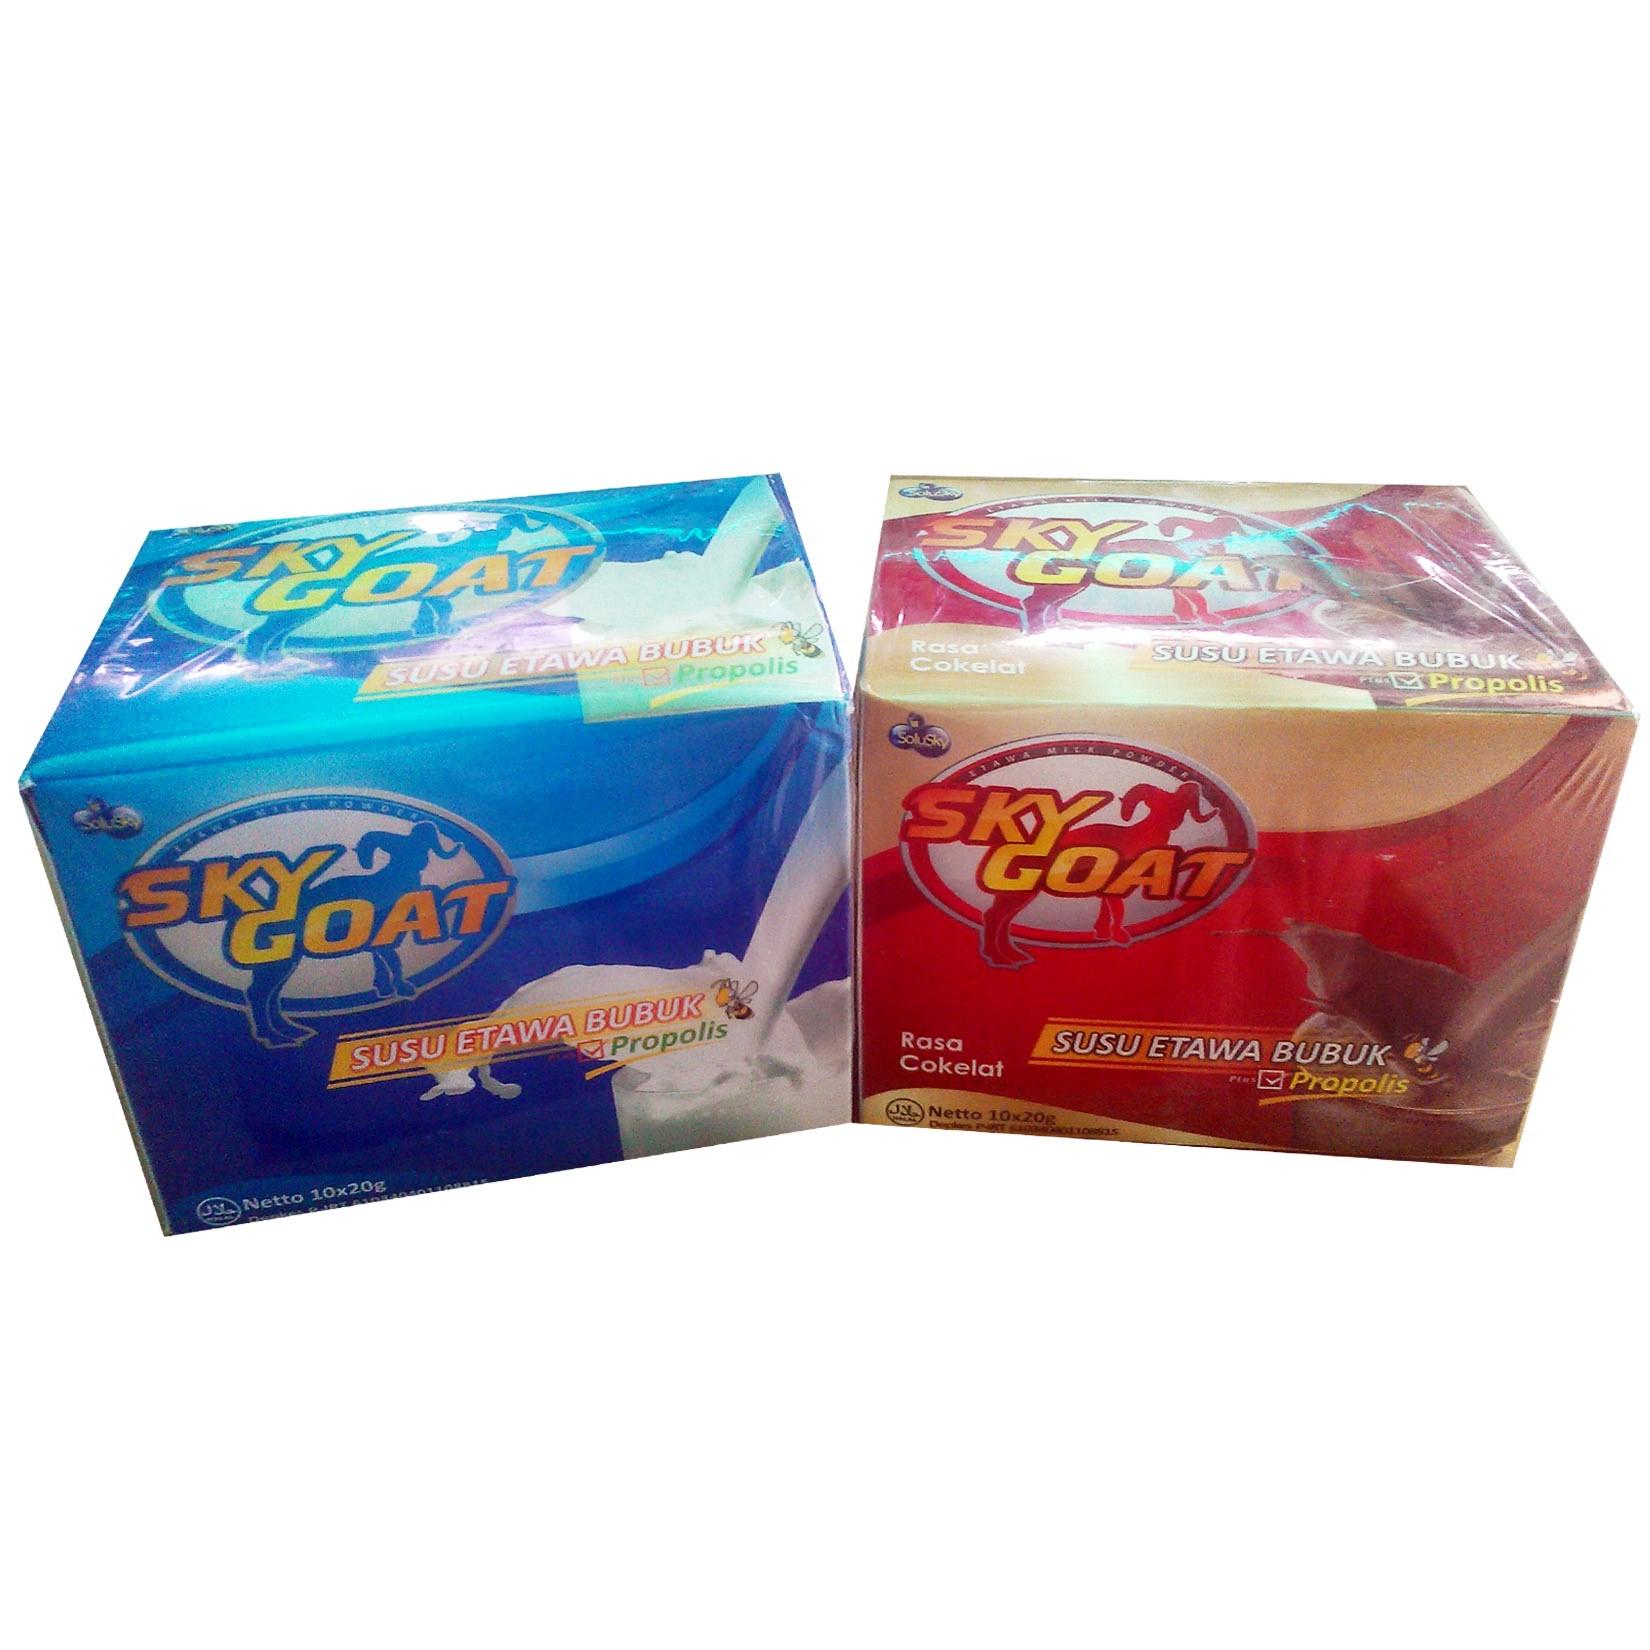 Skygoat Susu Etawa Propolis [2 Box]